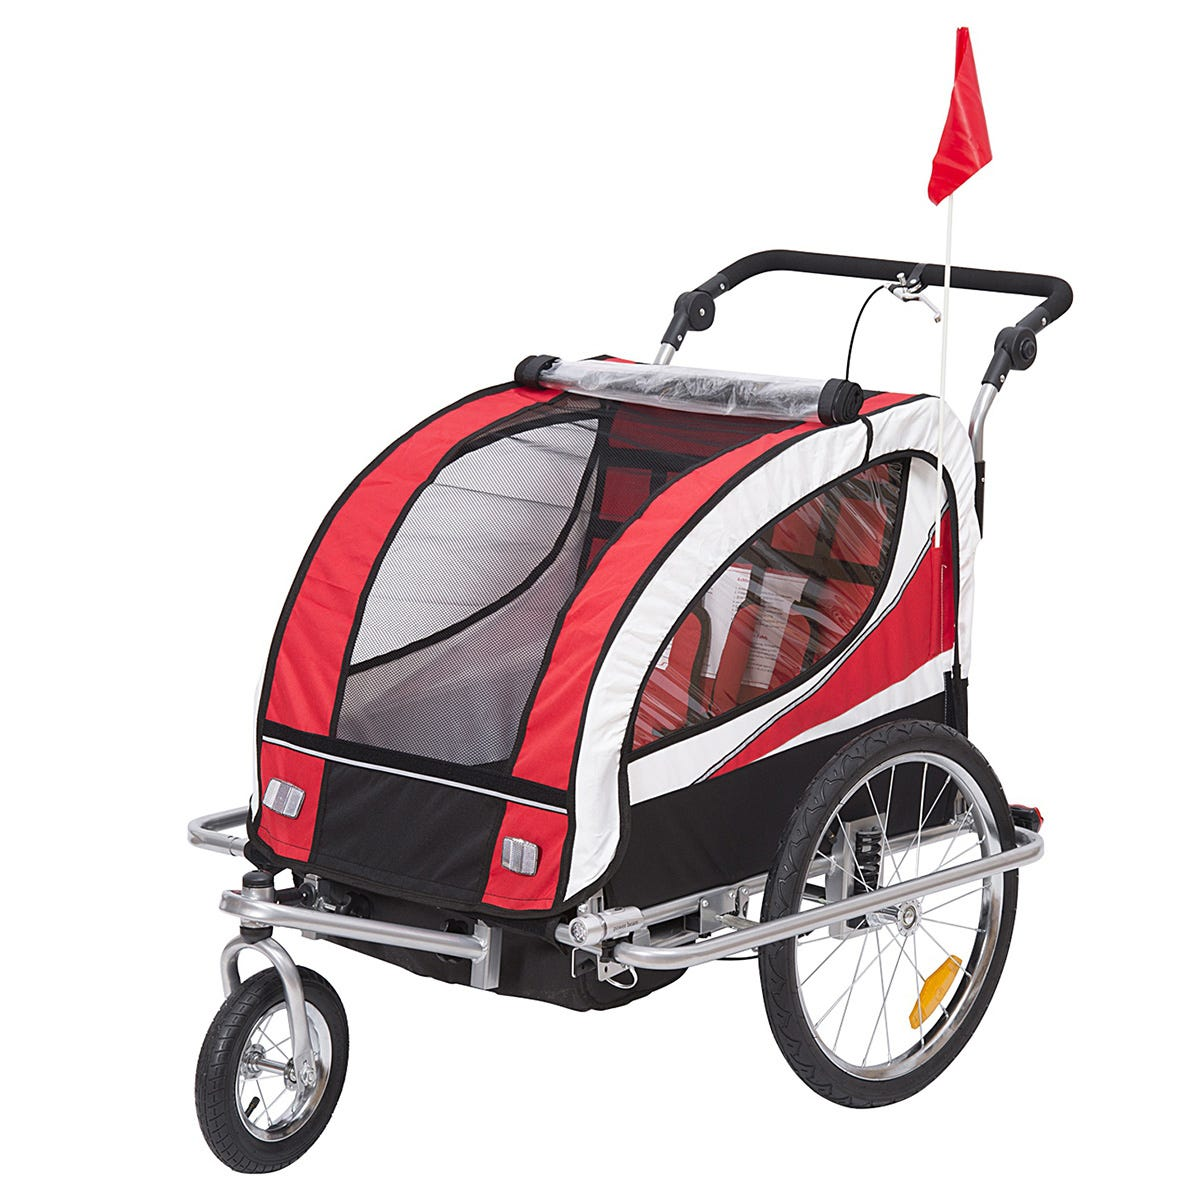 Reiten 2-in-1 Kids 2 Seater Bicycle Trailer & Stroller - Red/White/Black